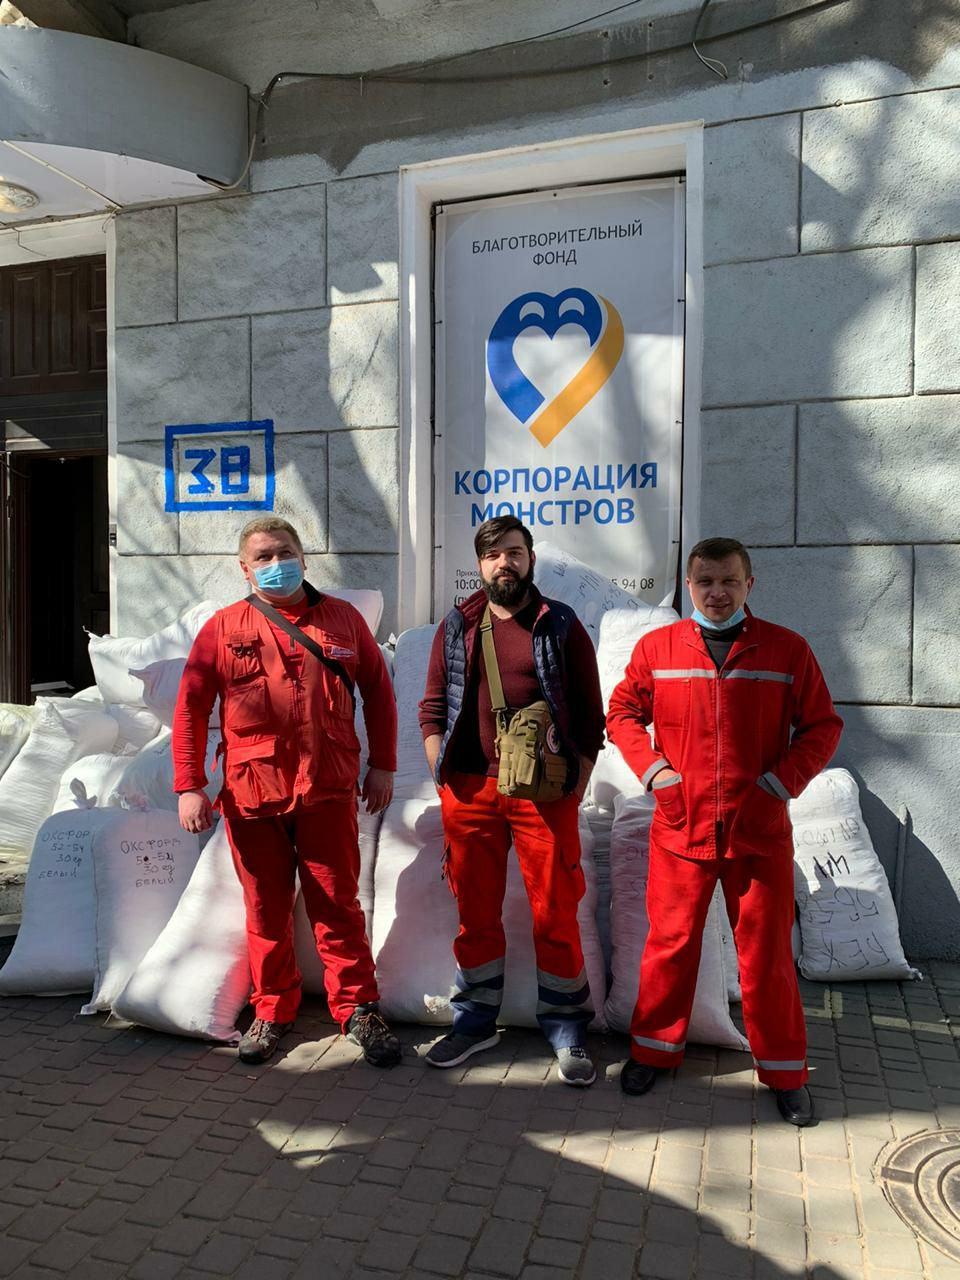 Подолаємо епідемію разом! - фото 2 - mtb.ua